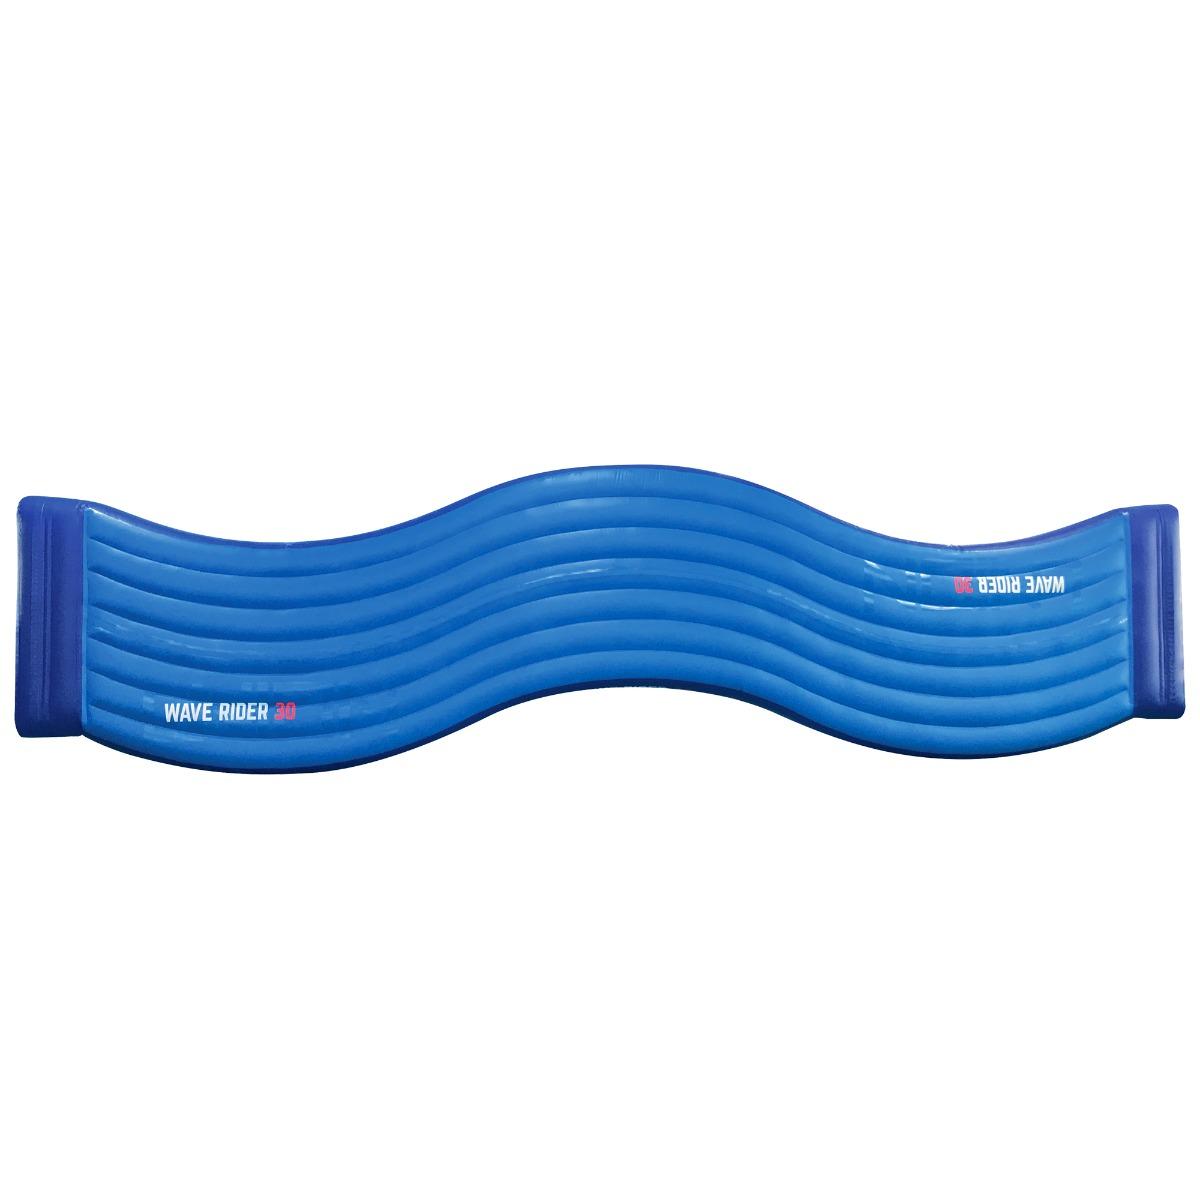 User Manual: Union Aquaparks Wave Rider 30